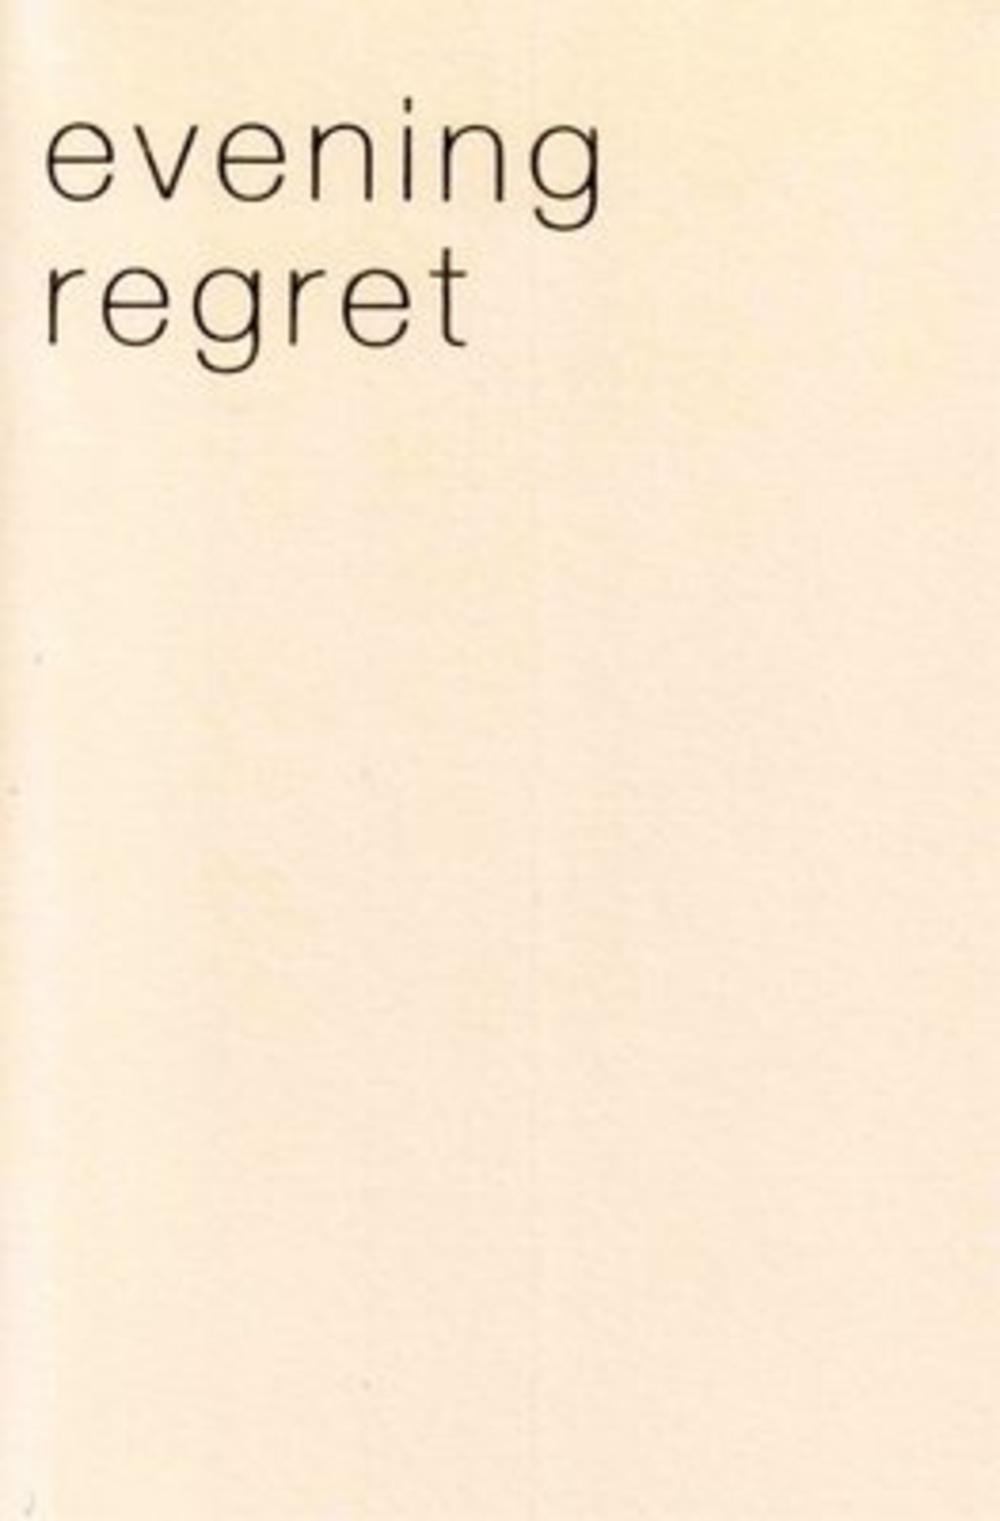 Evening Invitation Regret Greeting Card